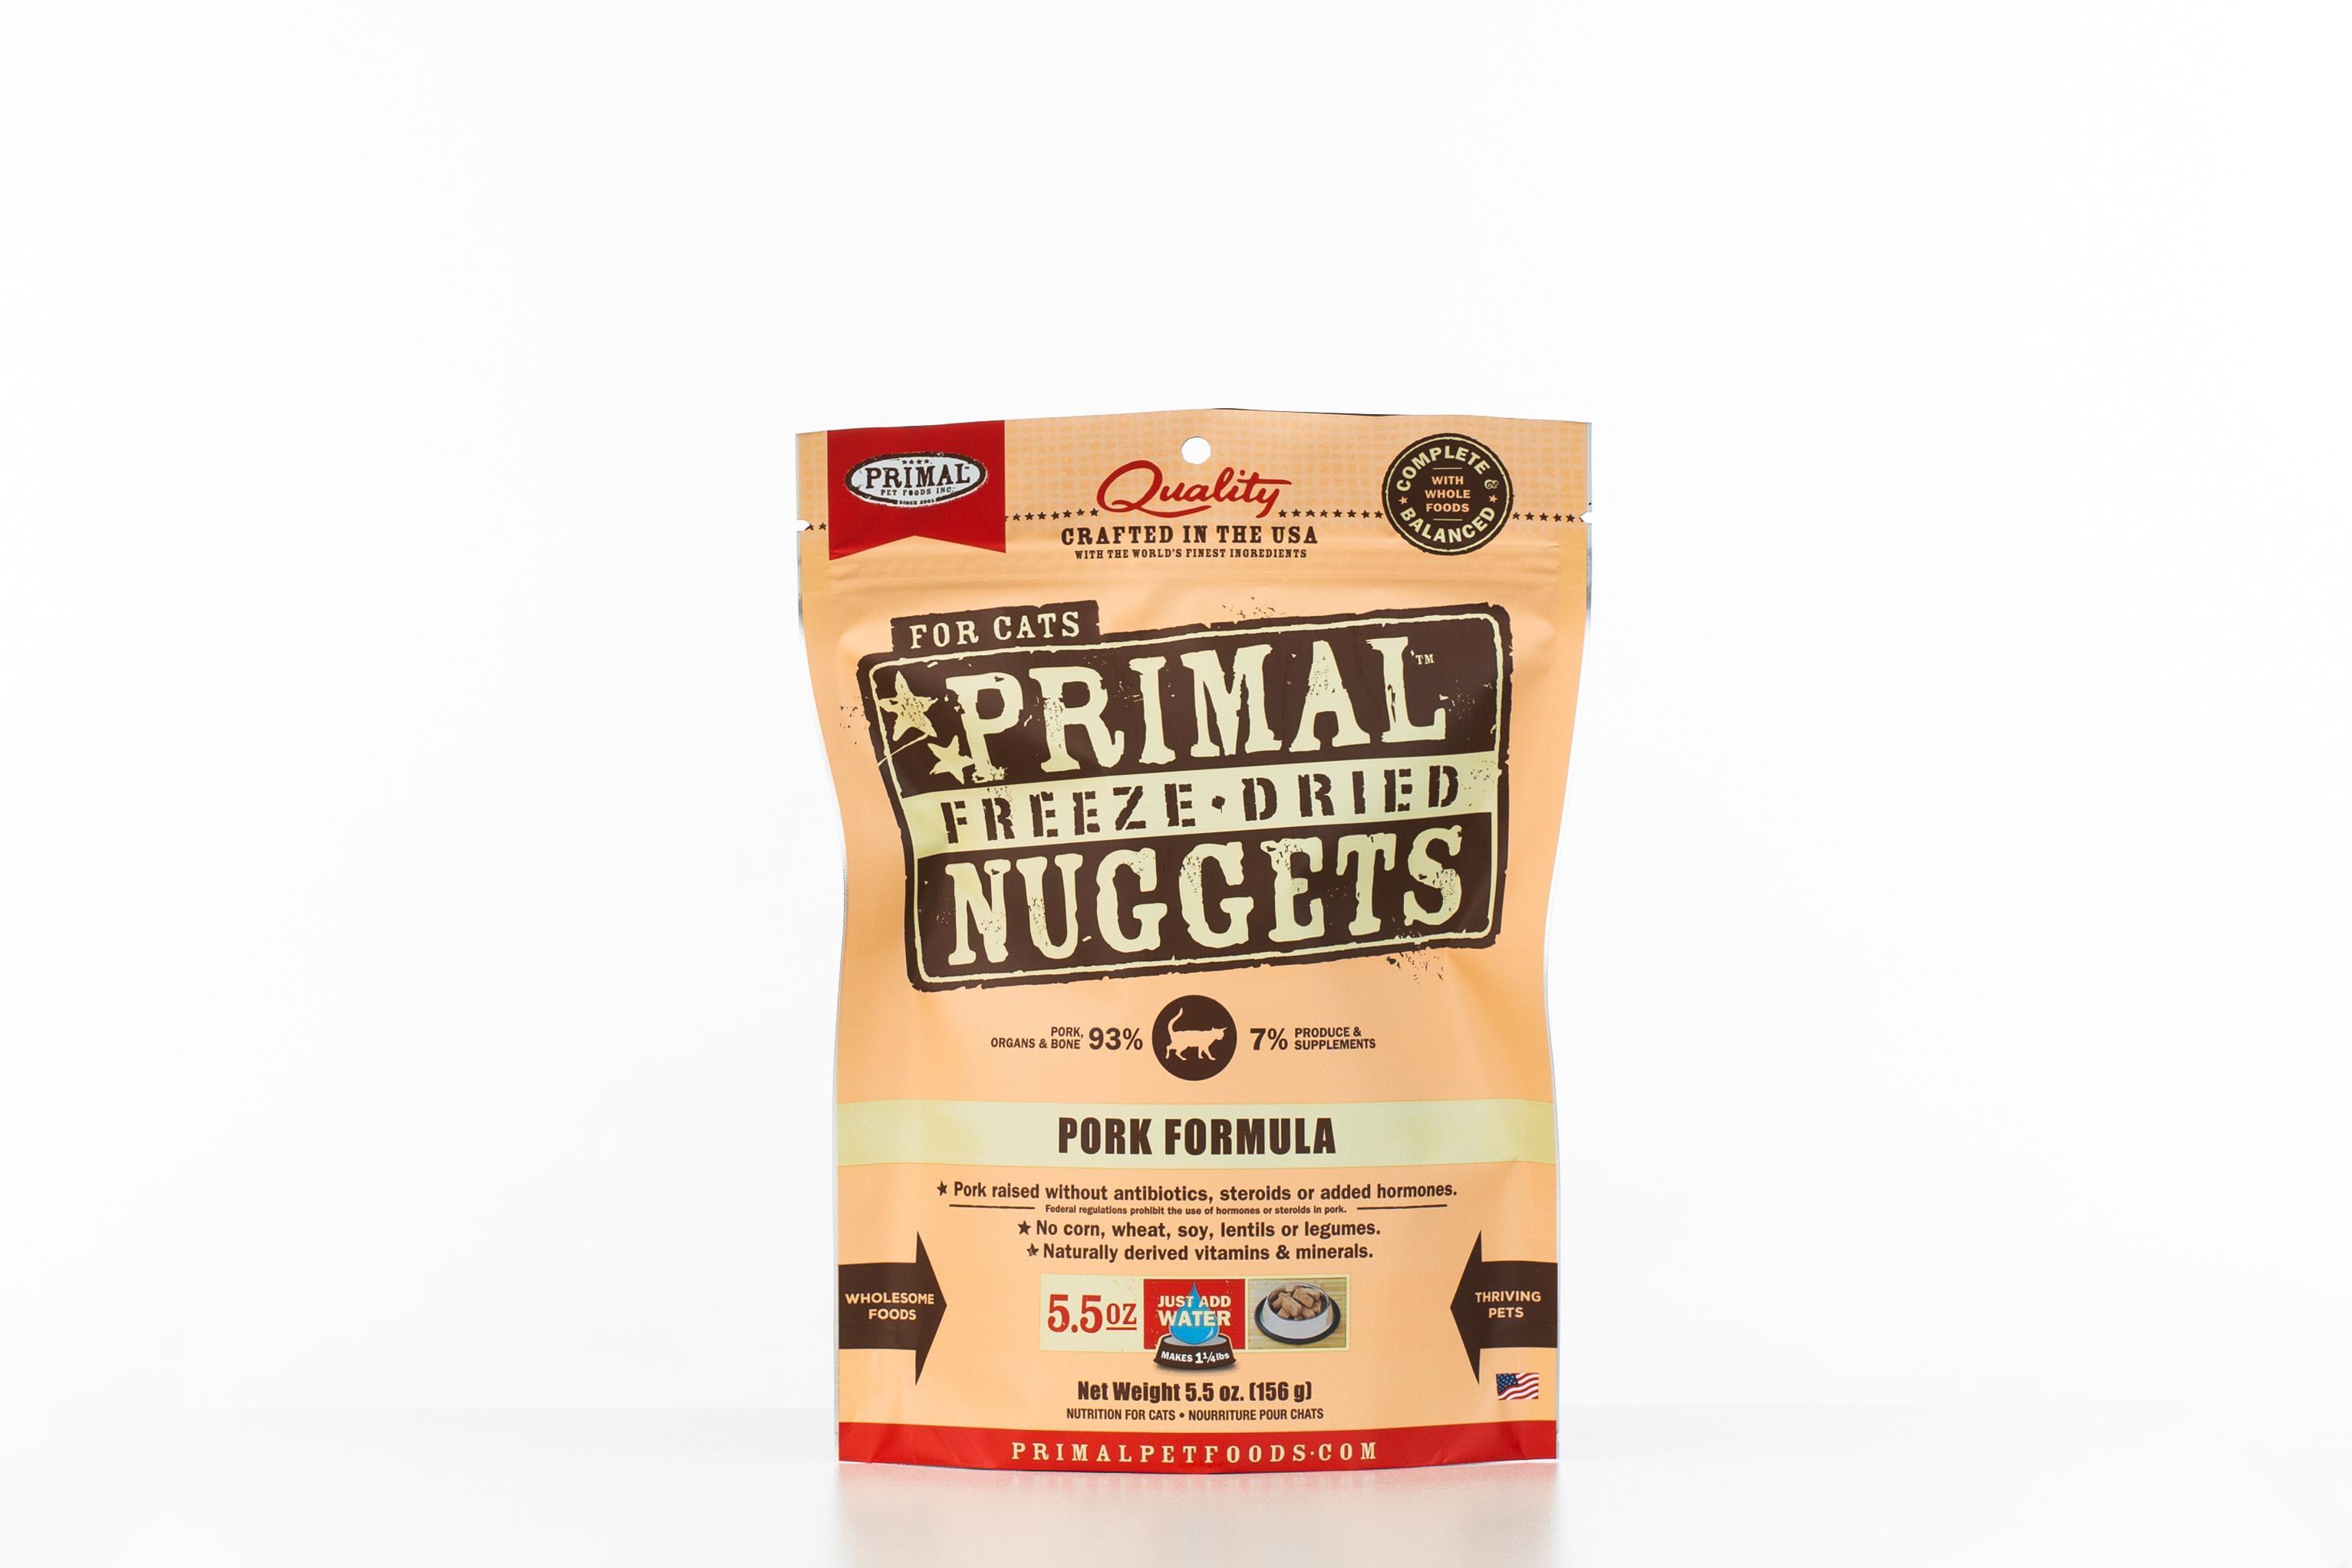 Primal Pork Formula Nuggets Grain-Free Raw Freeze-Dried Cat Food Image